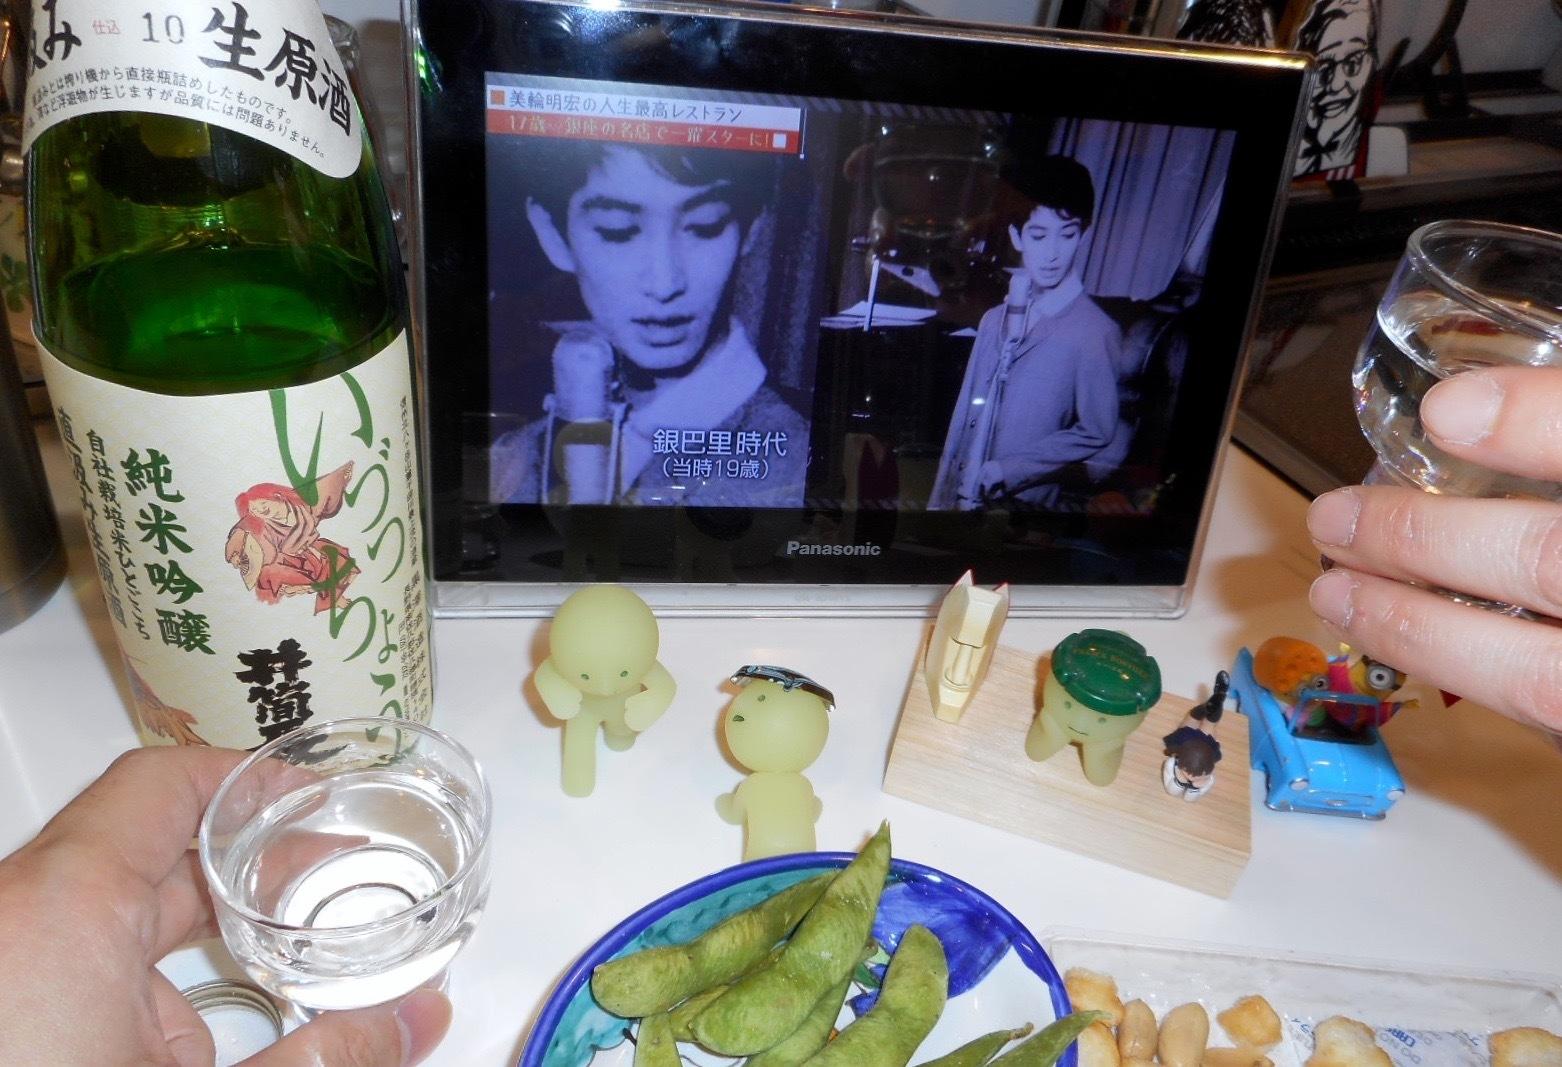 izutsuchou_jikagumi29by4.jpg